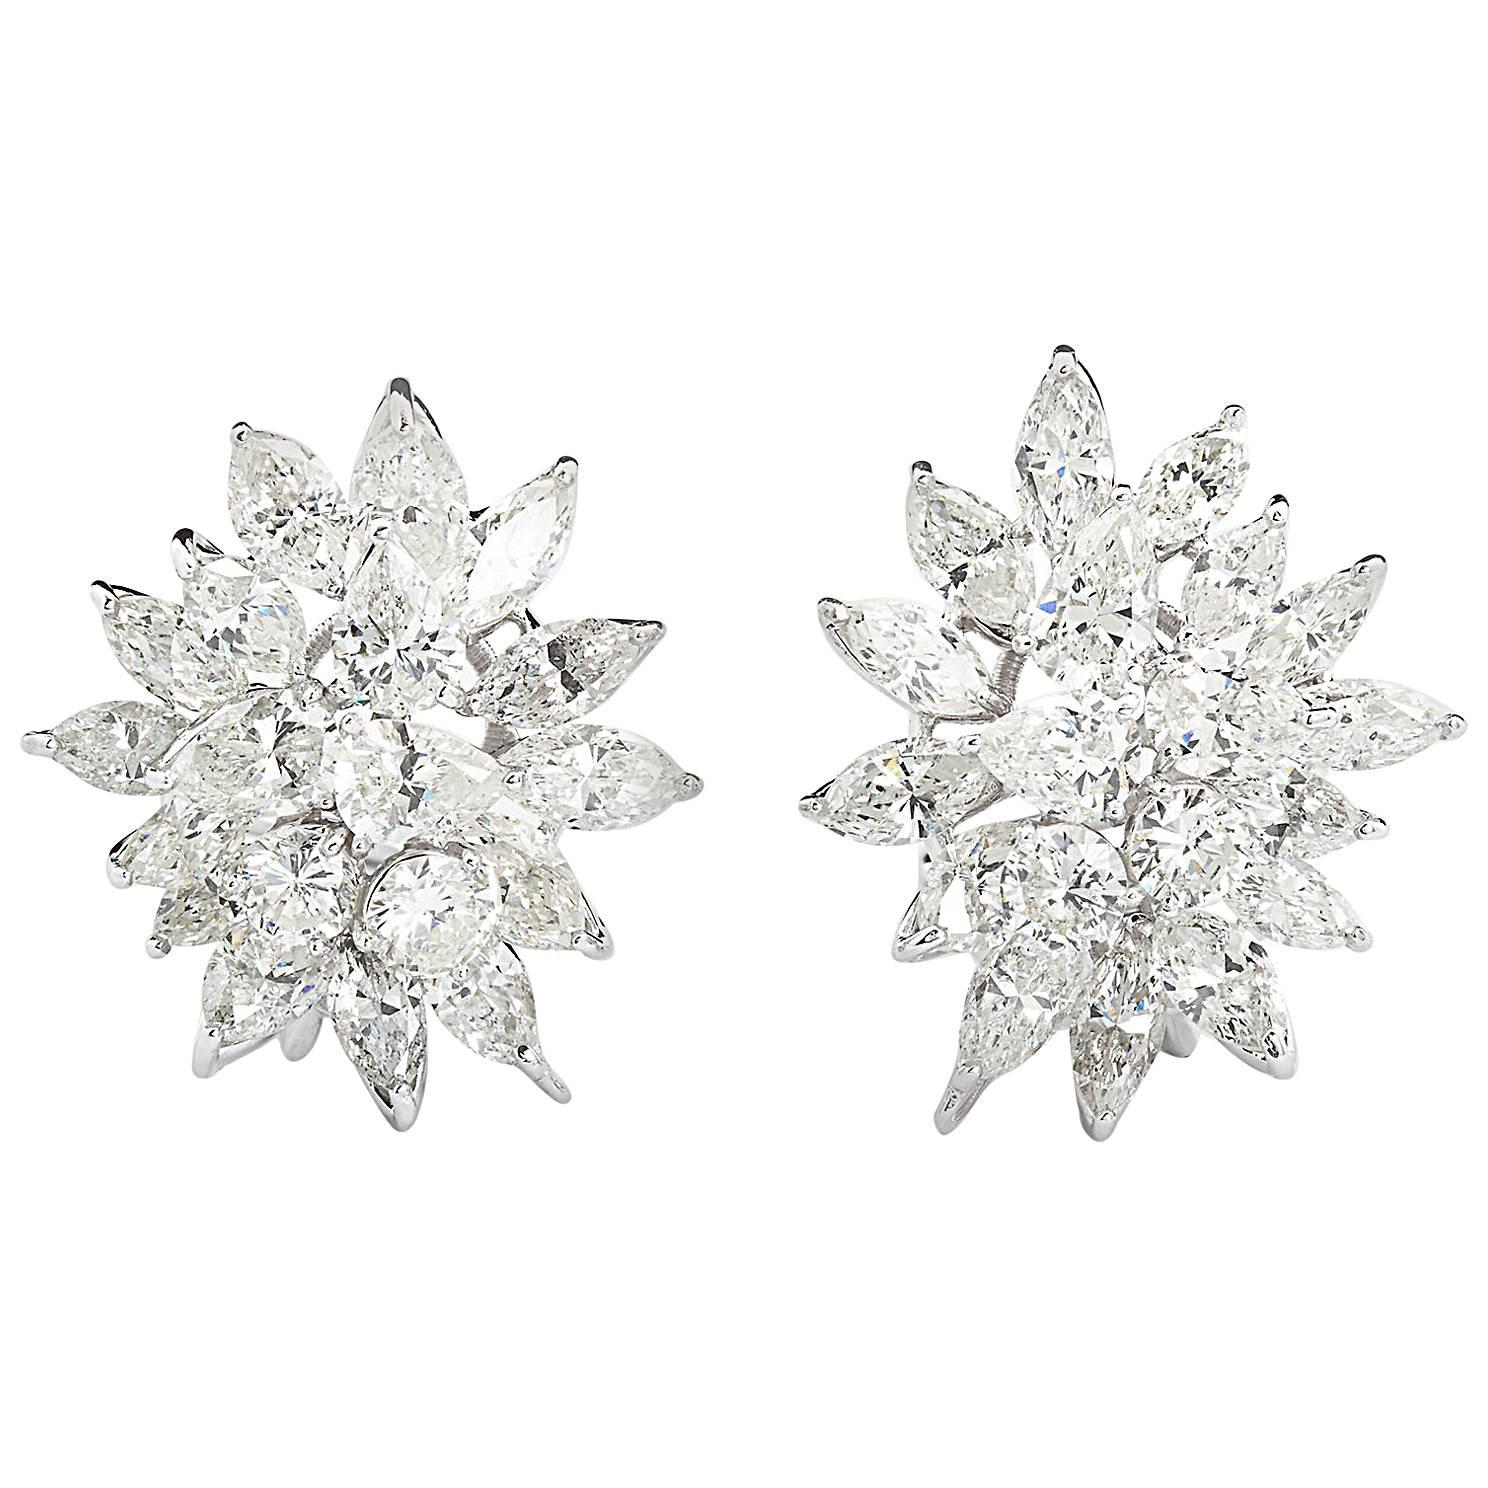 Diamond Cluster Earrings 13 Carat